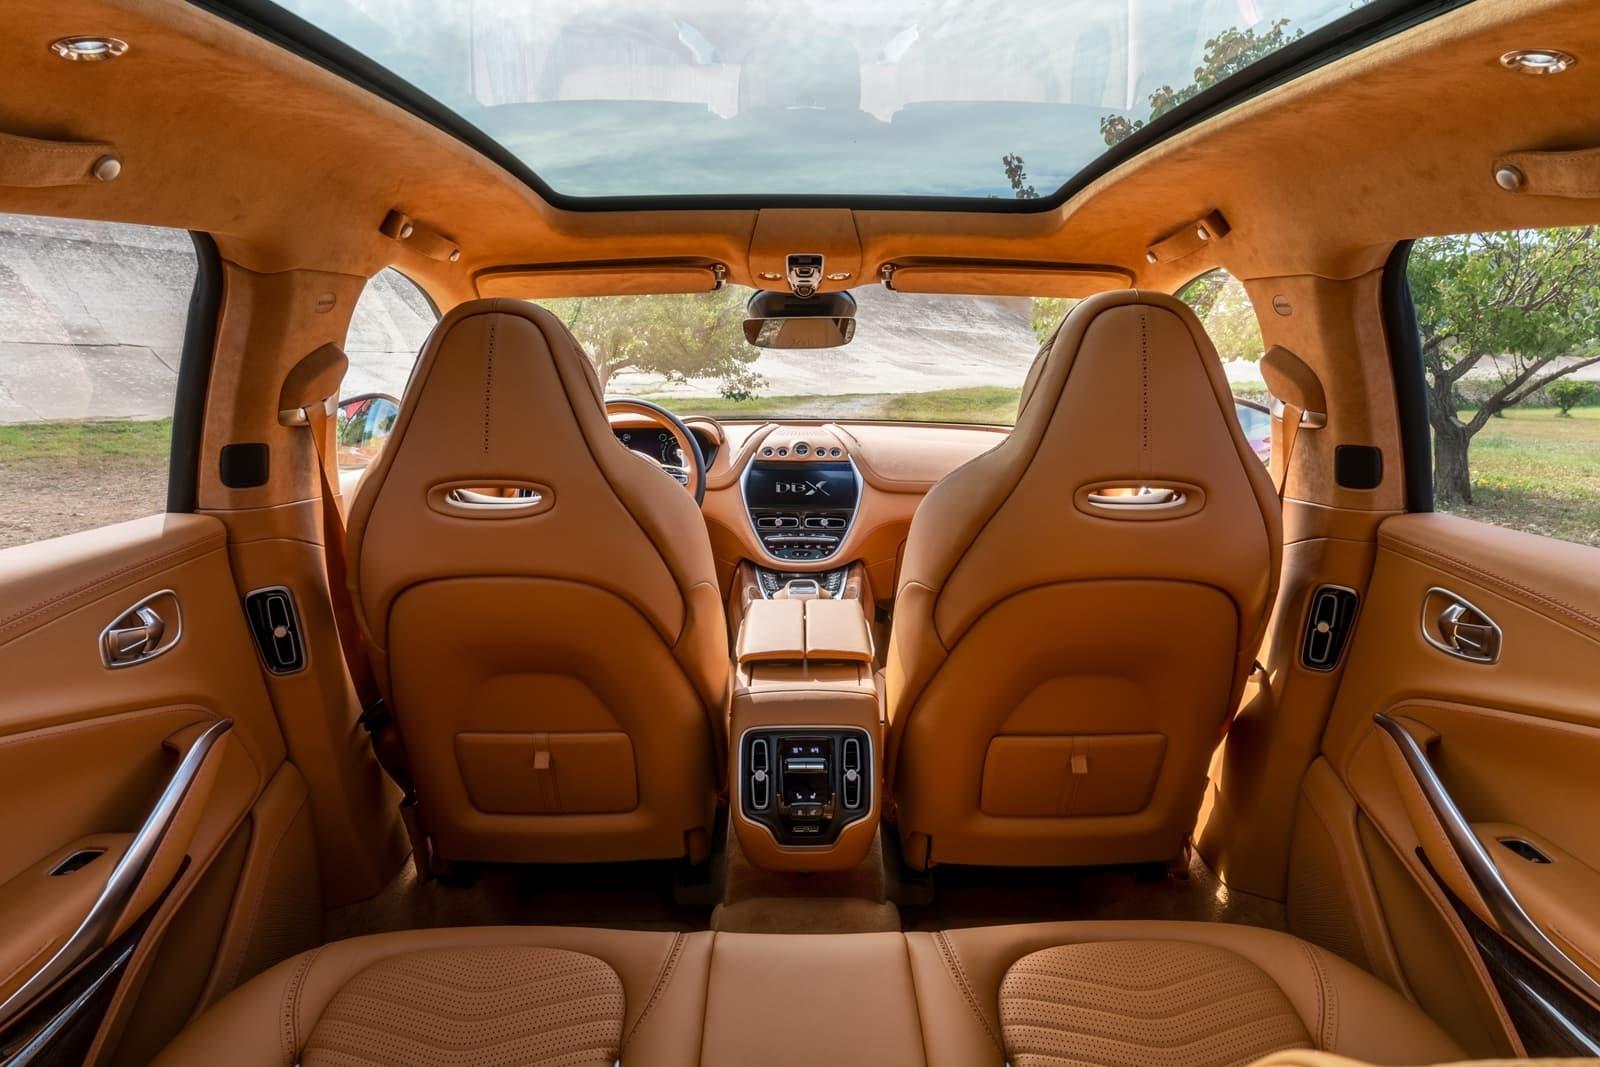 Aston Martin Dbx Interior 1019 01